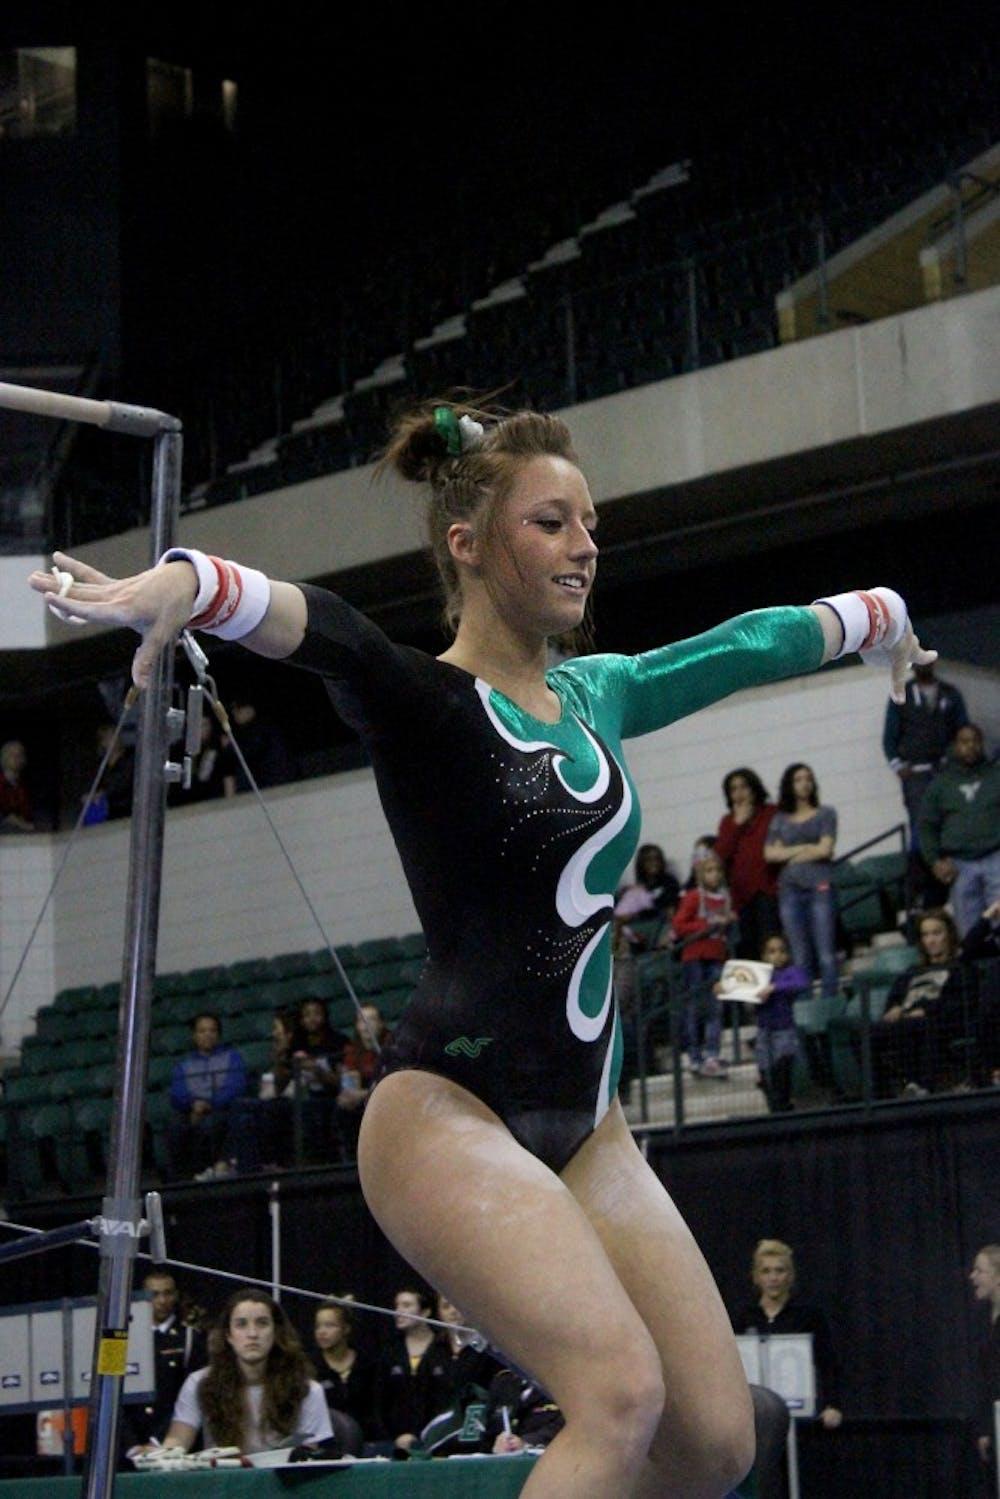 Willette nabs NCAA Regional Championship bid